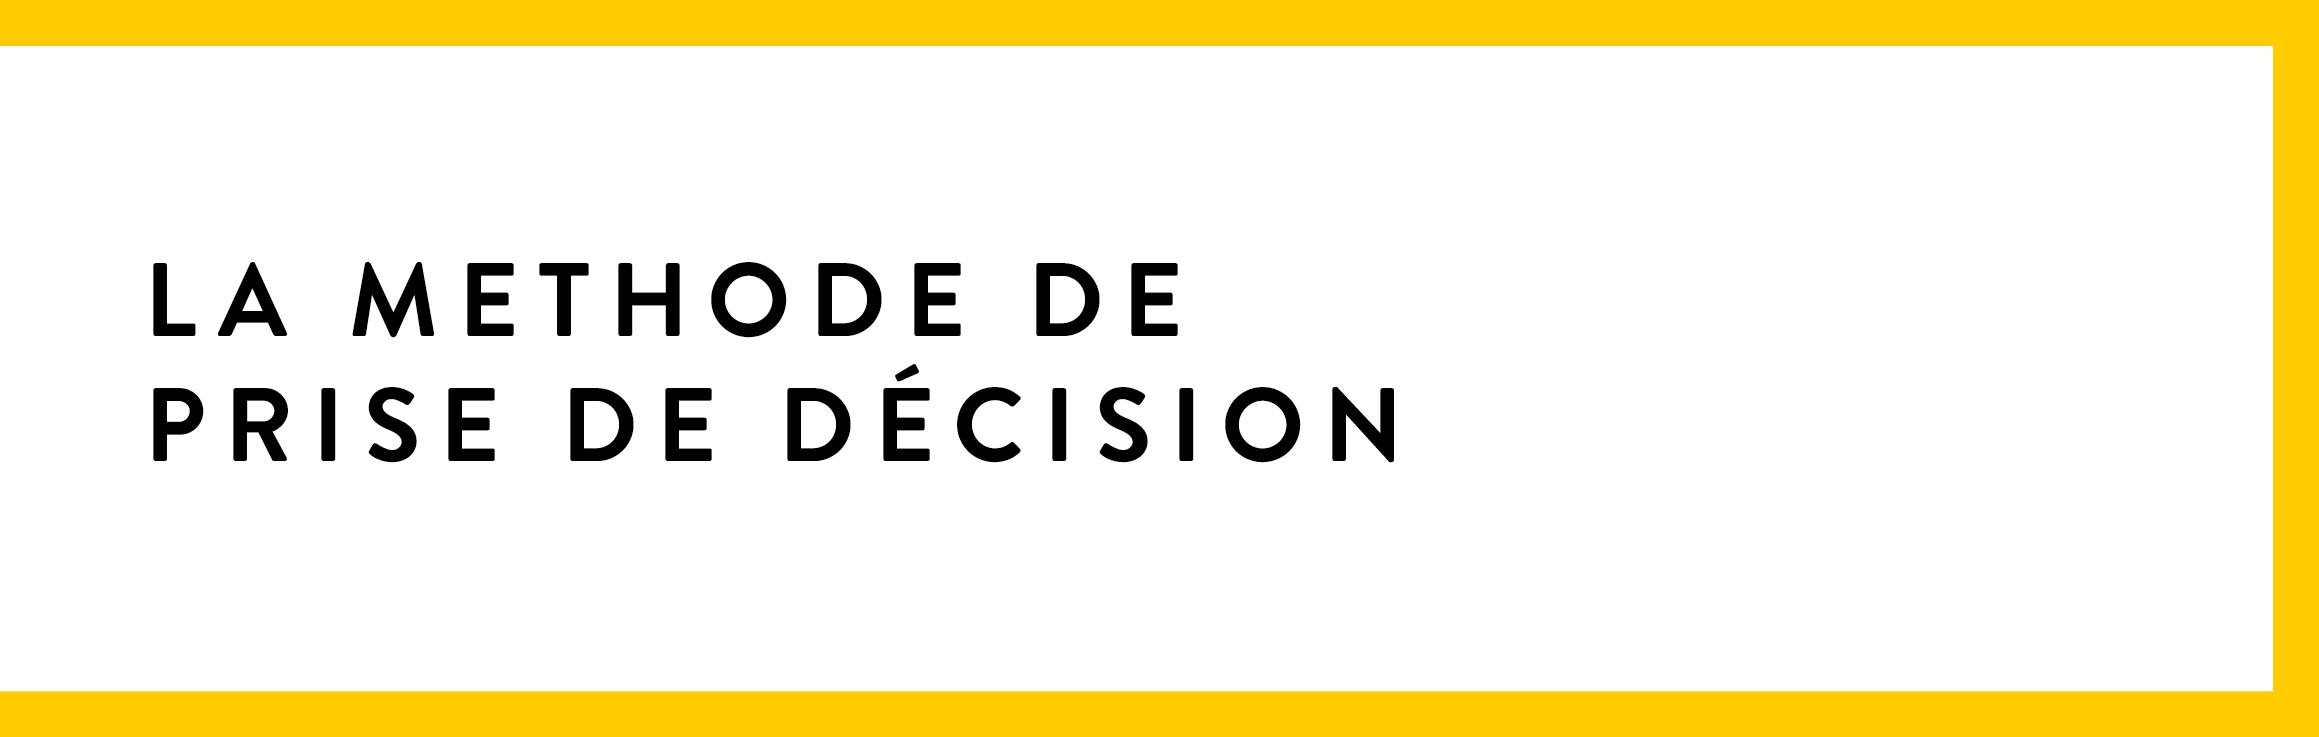 bouton-lamethodedeprisedecision.png